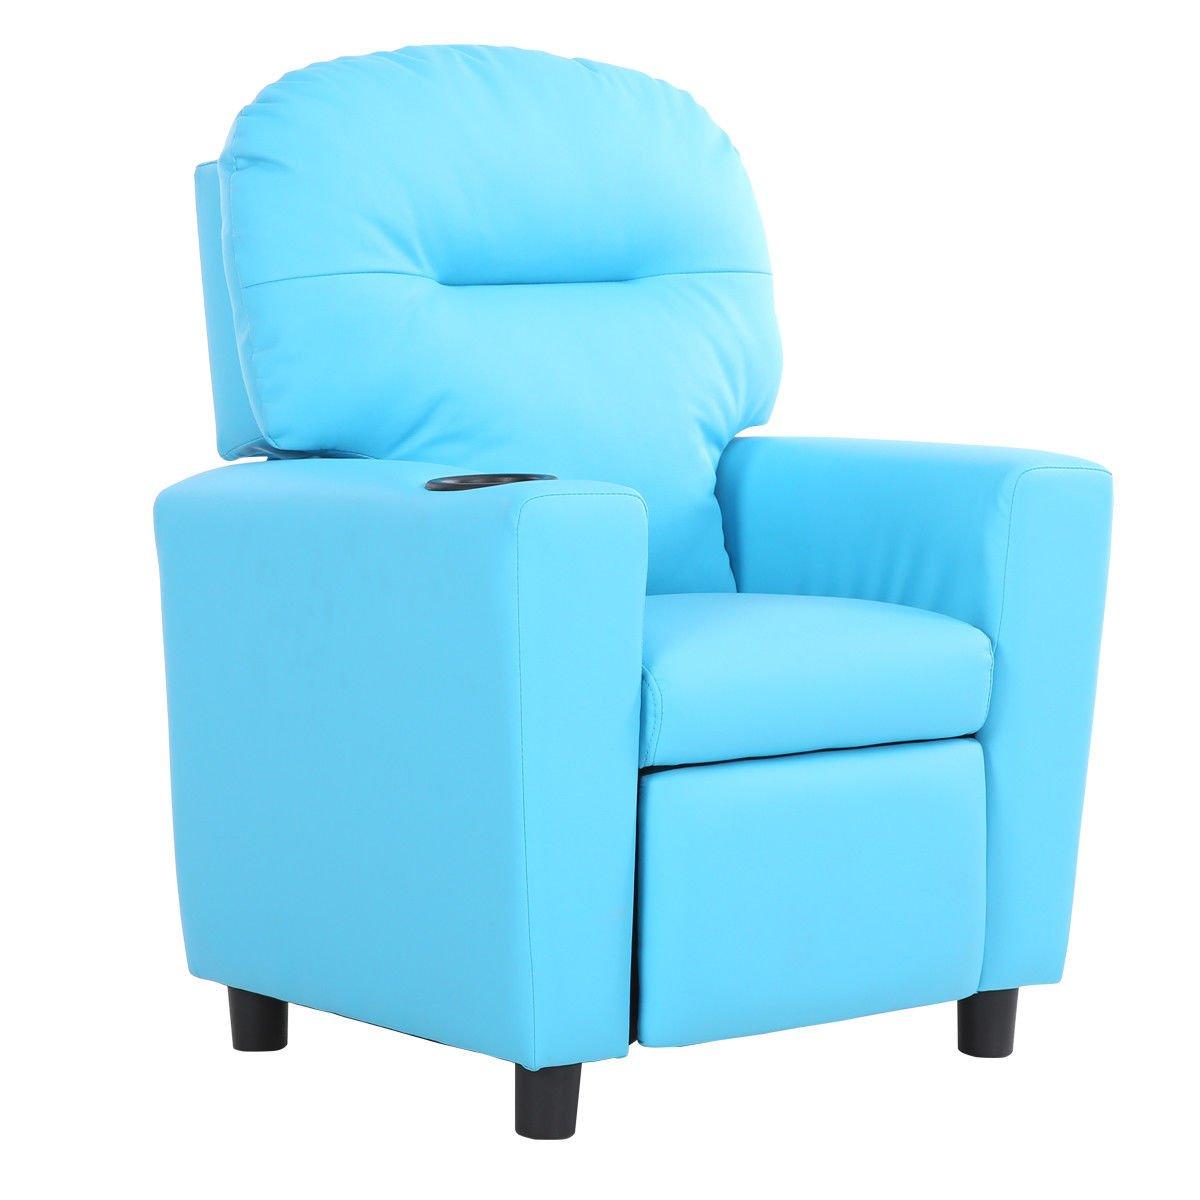 Blue Wood+PU+sponge Kid Armchair With Ebook